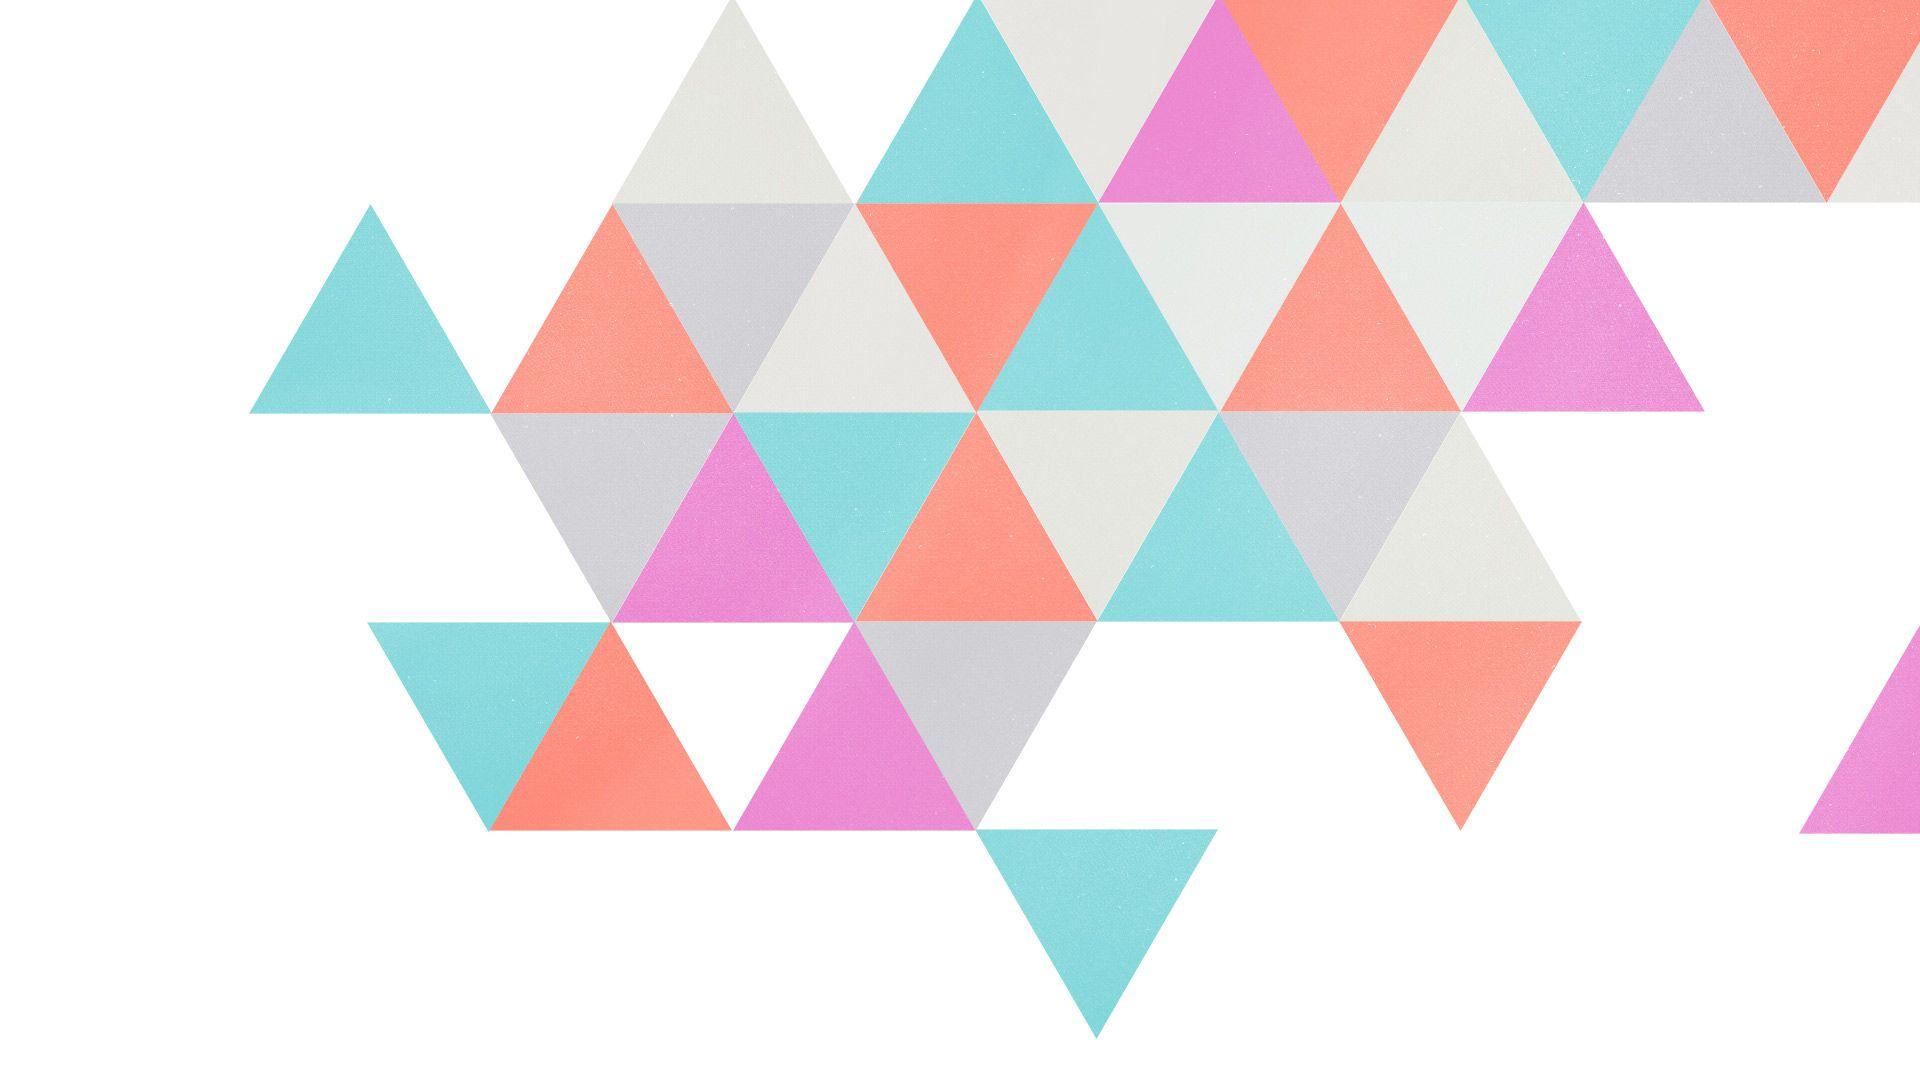 Textured Geometric Desktop Wallpaper 1920x1080